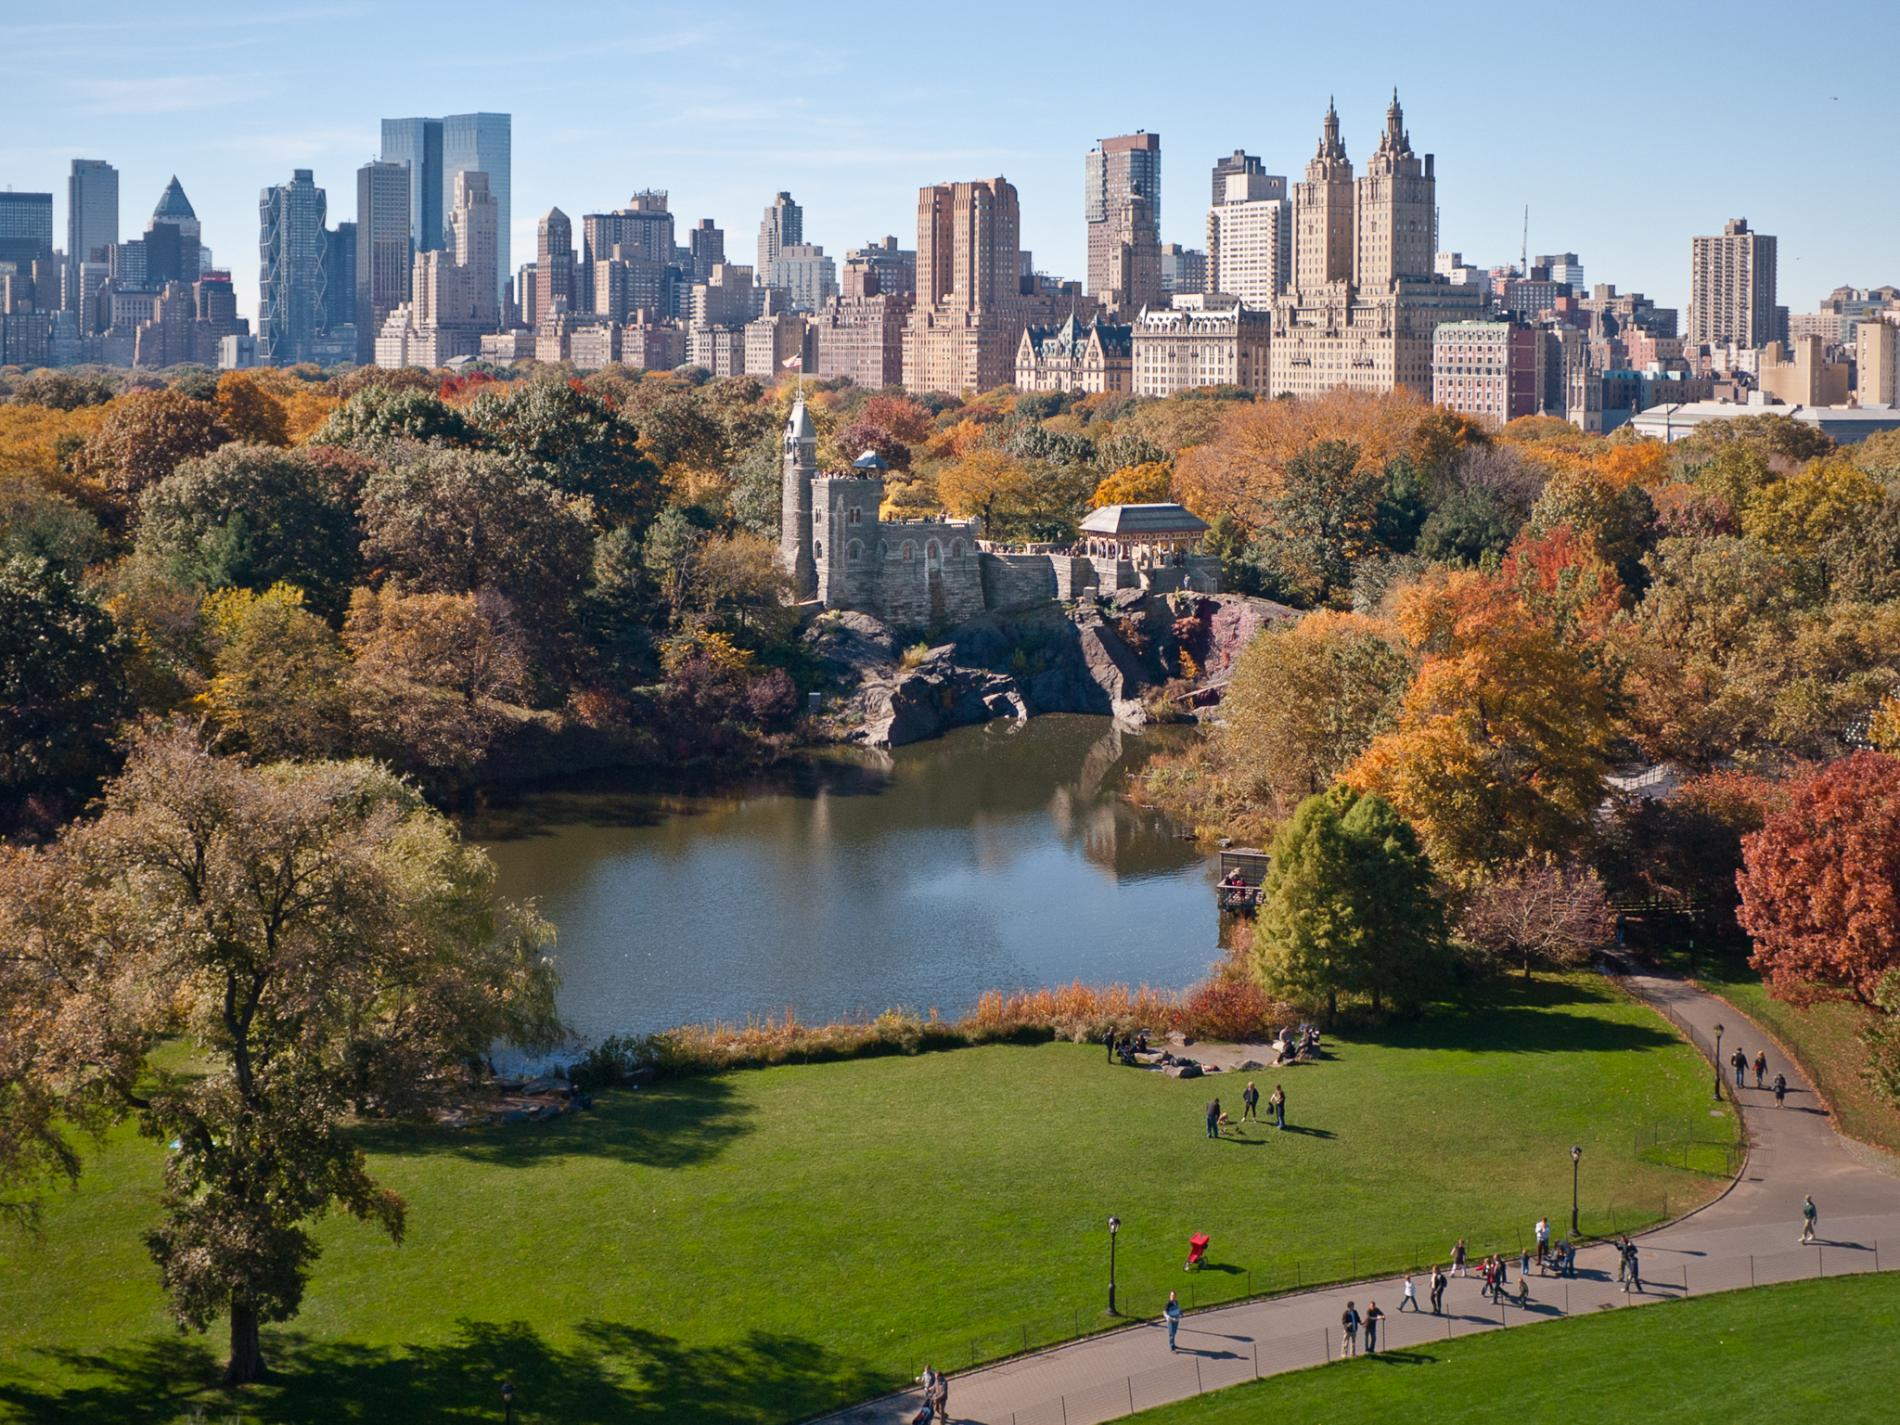 Central Park, New York City - Tourist Destinations